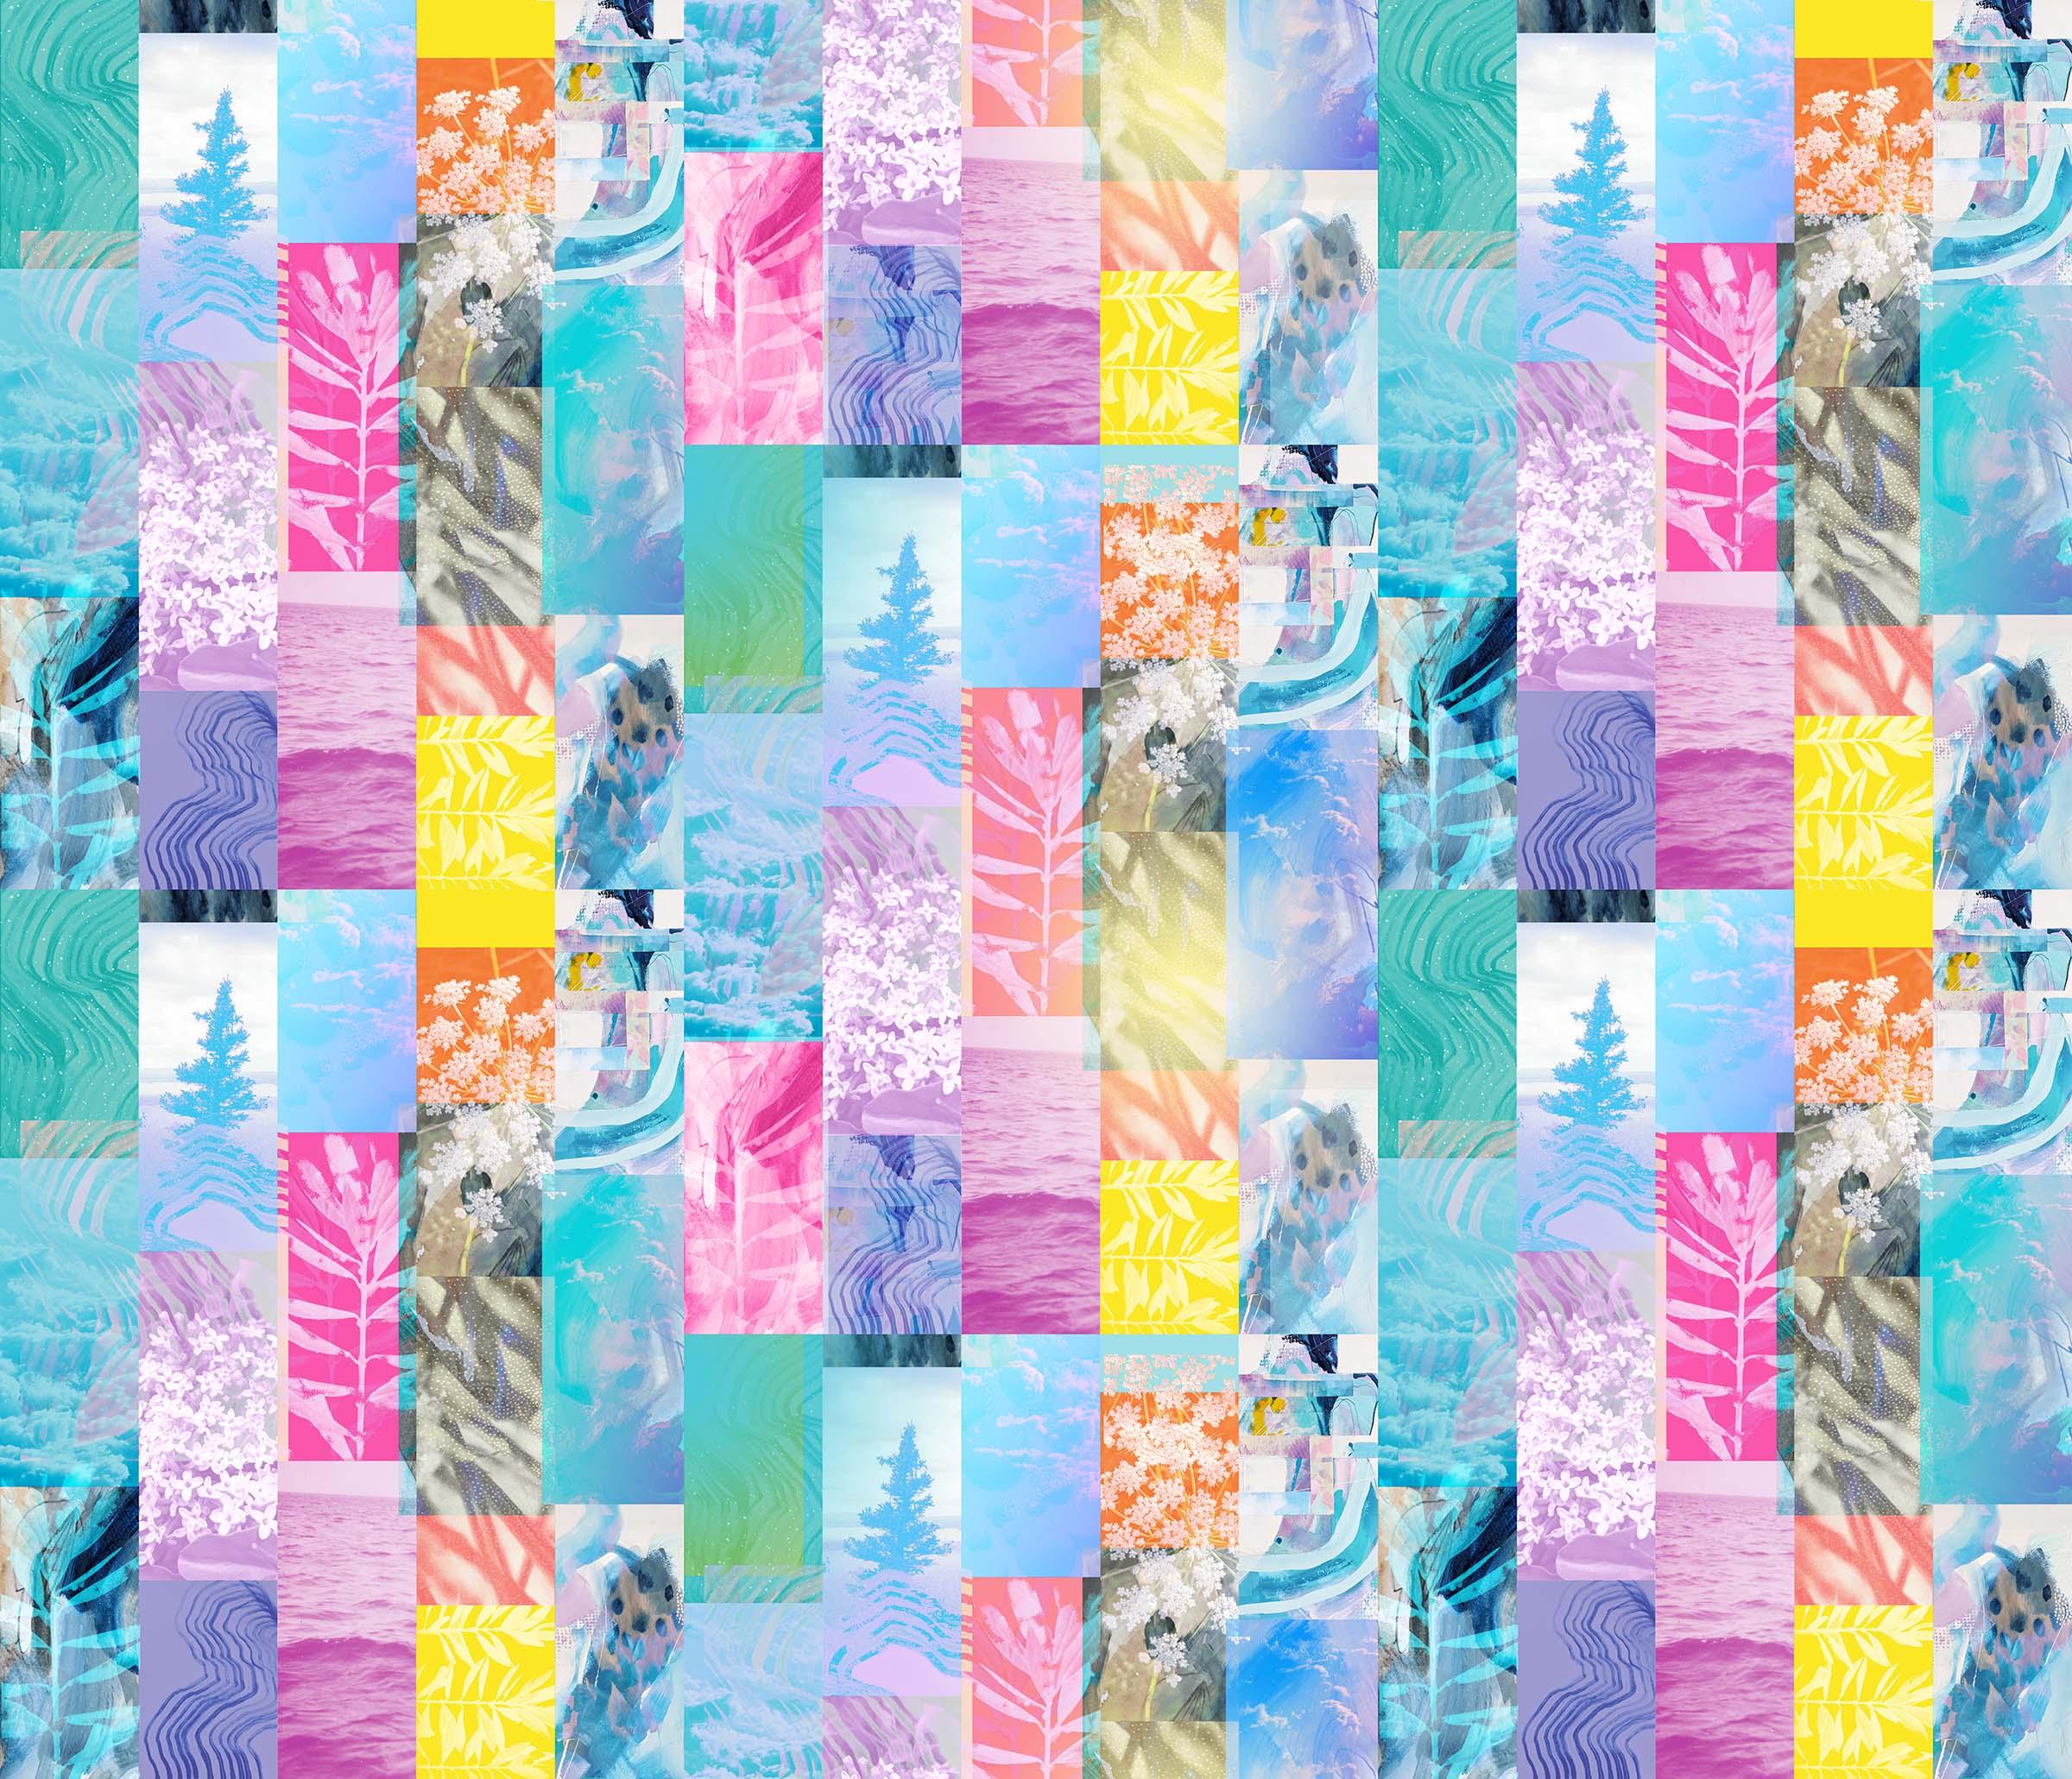 colourful quilt, rectangular shapes each illustrating natural motifs.